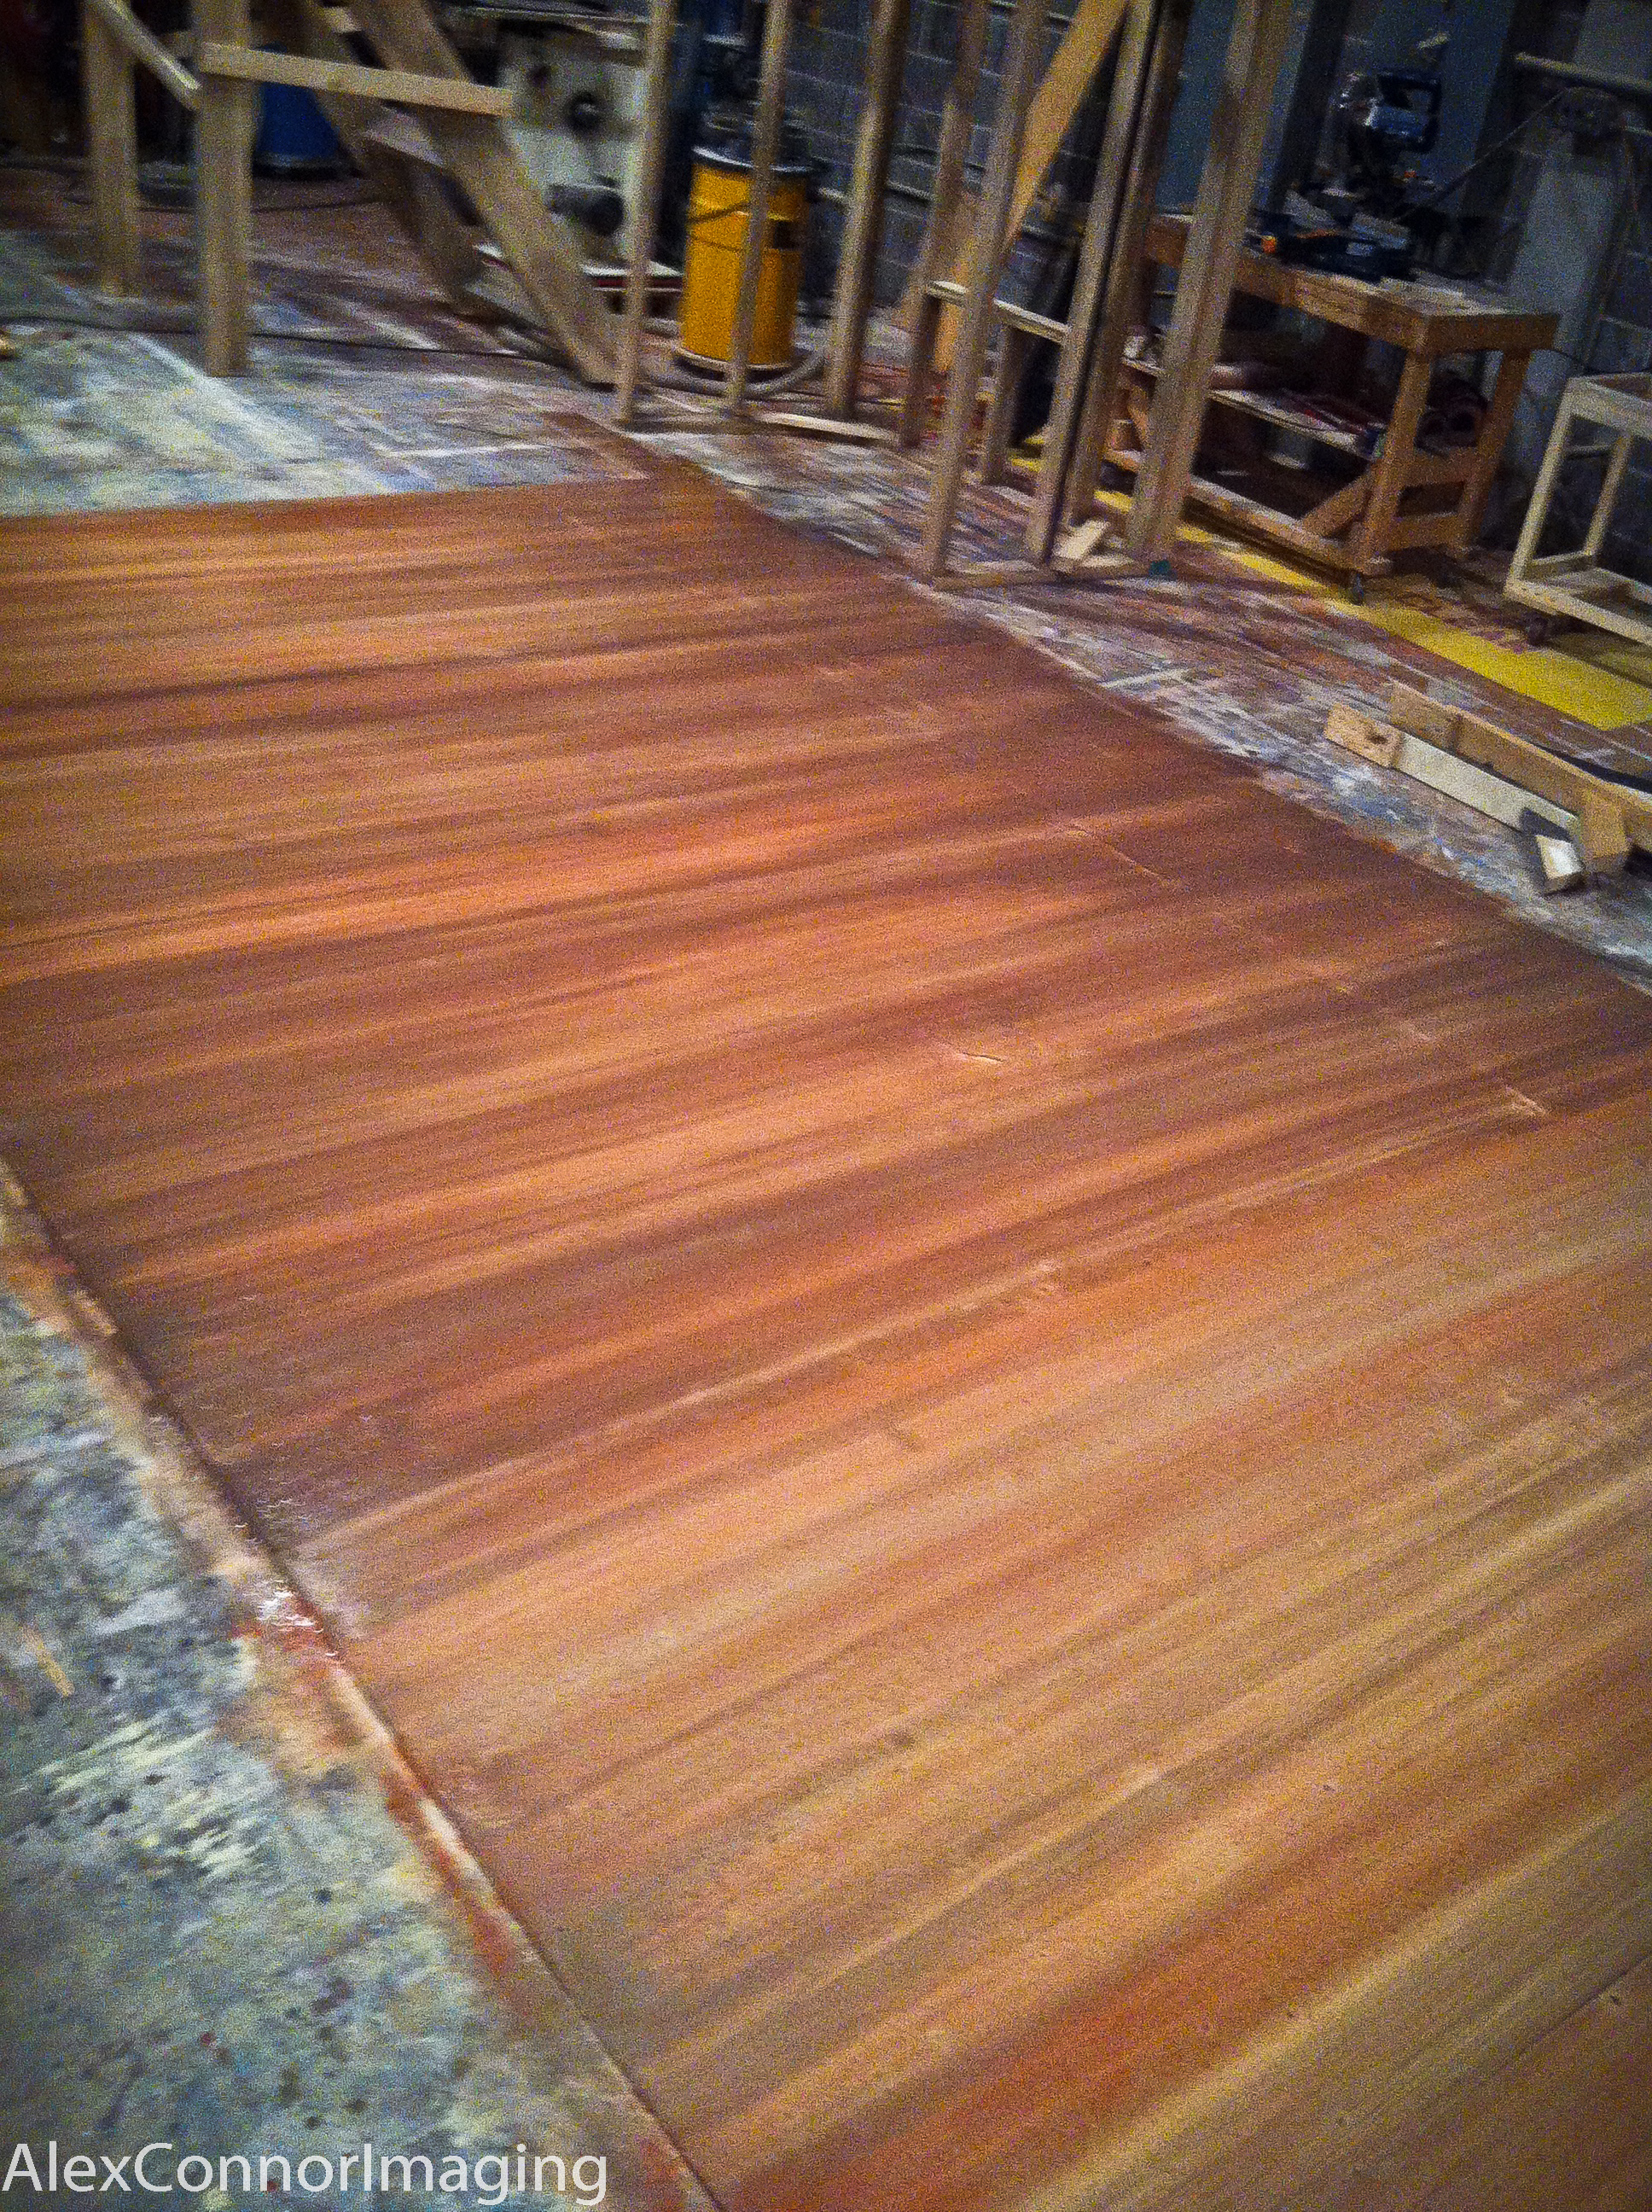 In progress several step wood grain